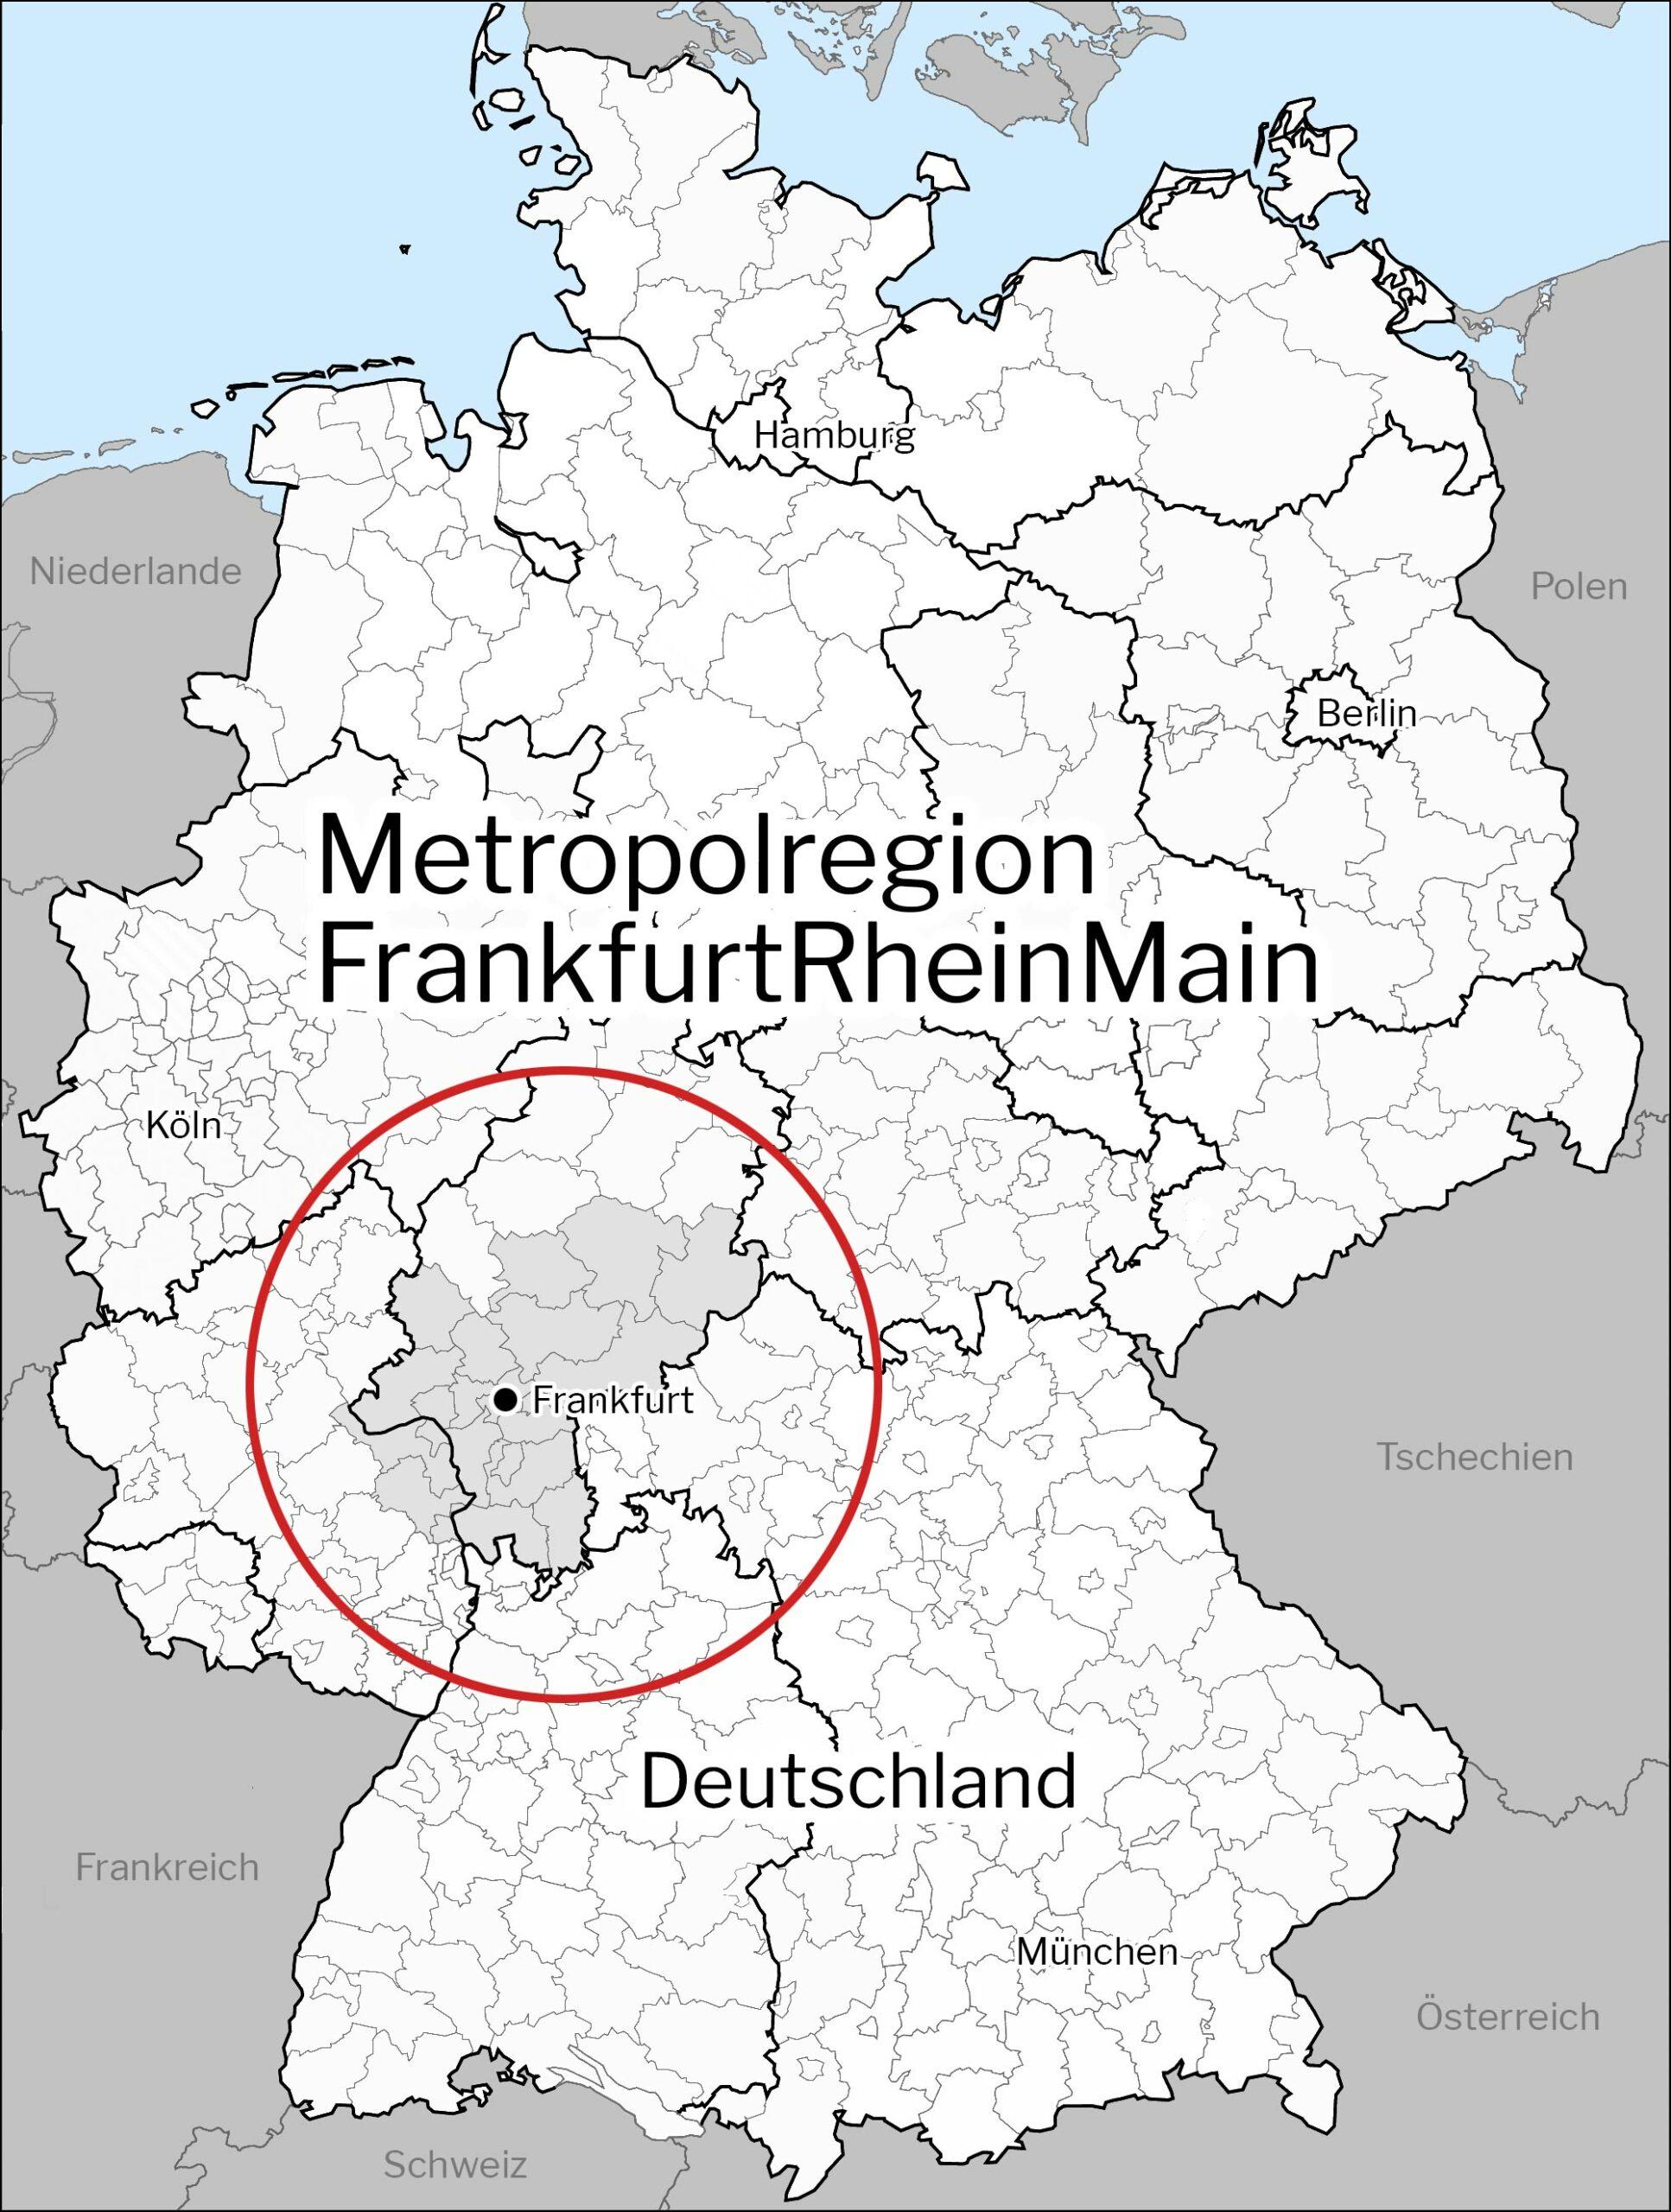 Metropolregion Frankfurt/Rhein-Main - Karte - Rhein-Main-Gebiet Definition